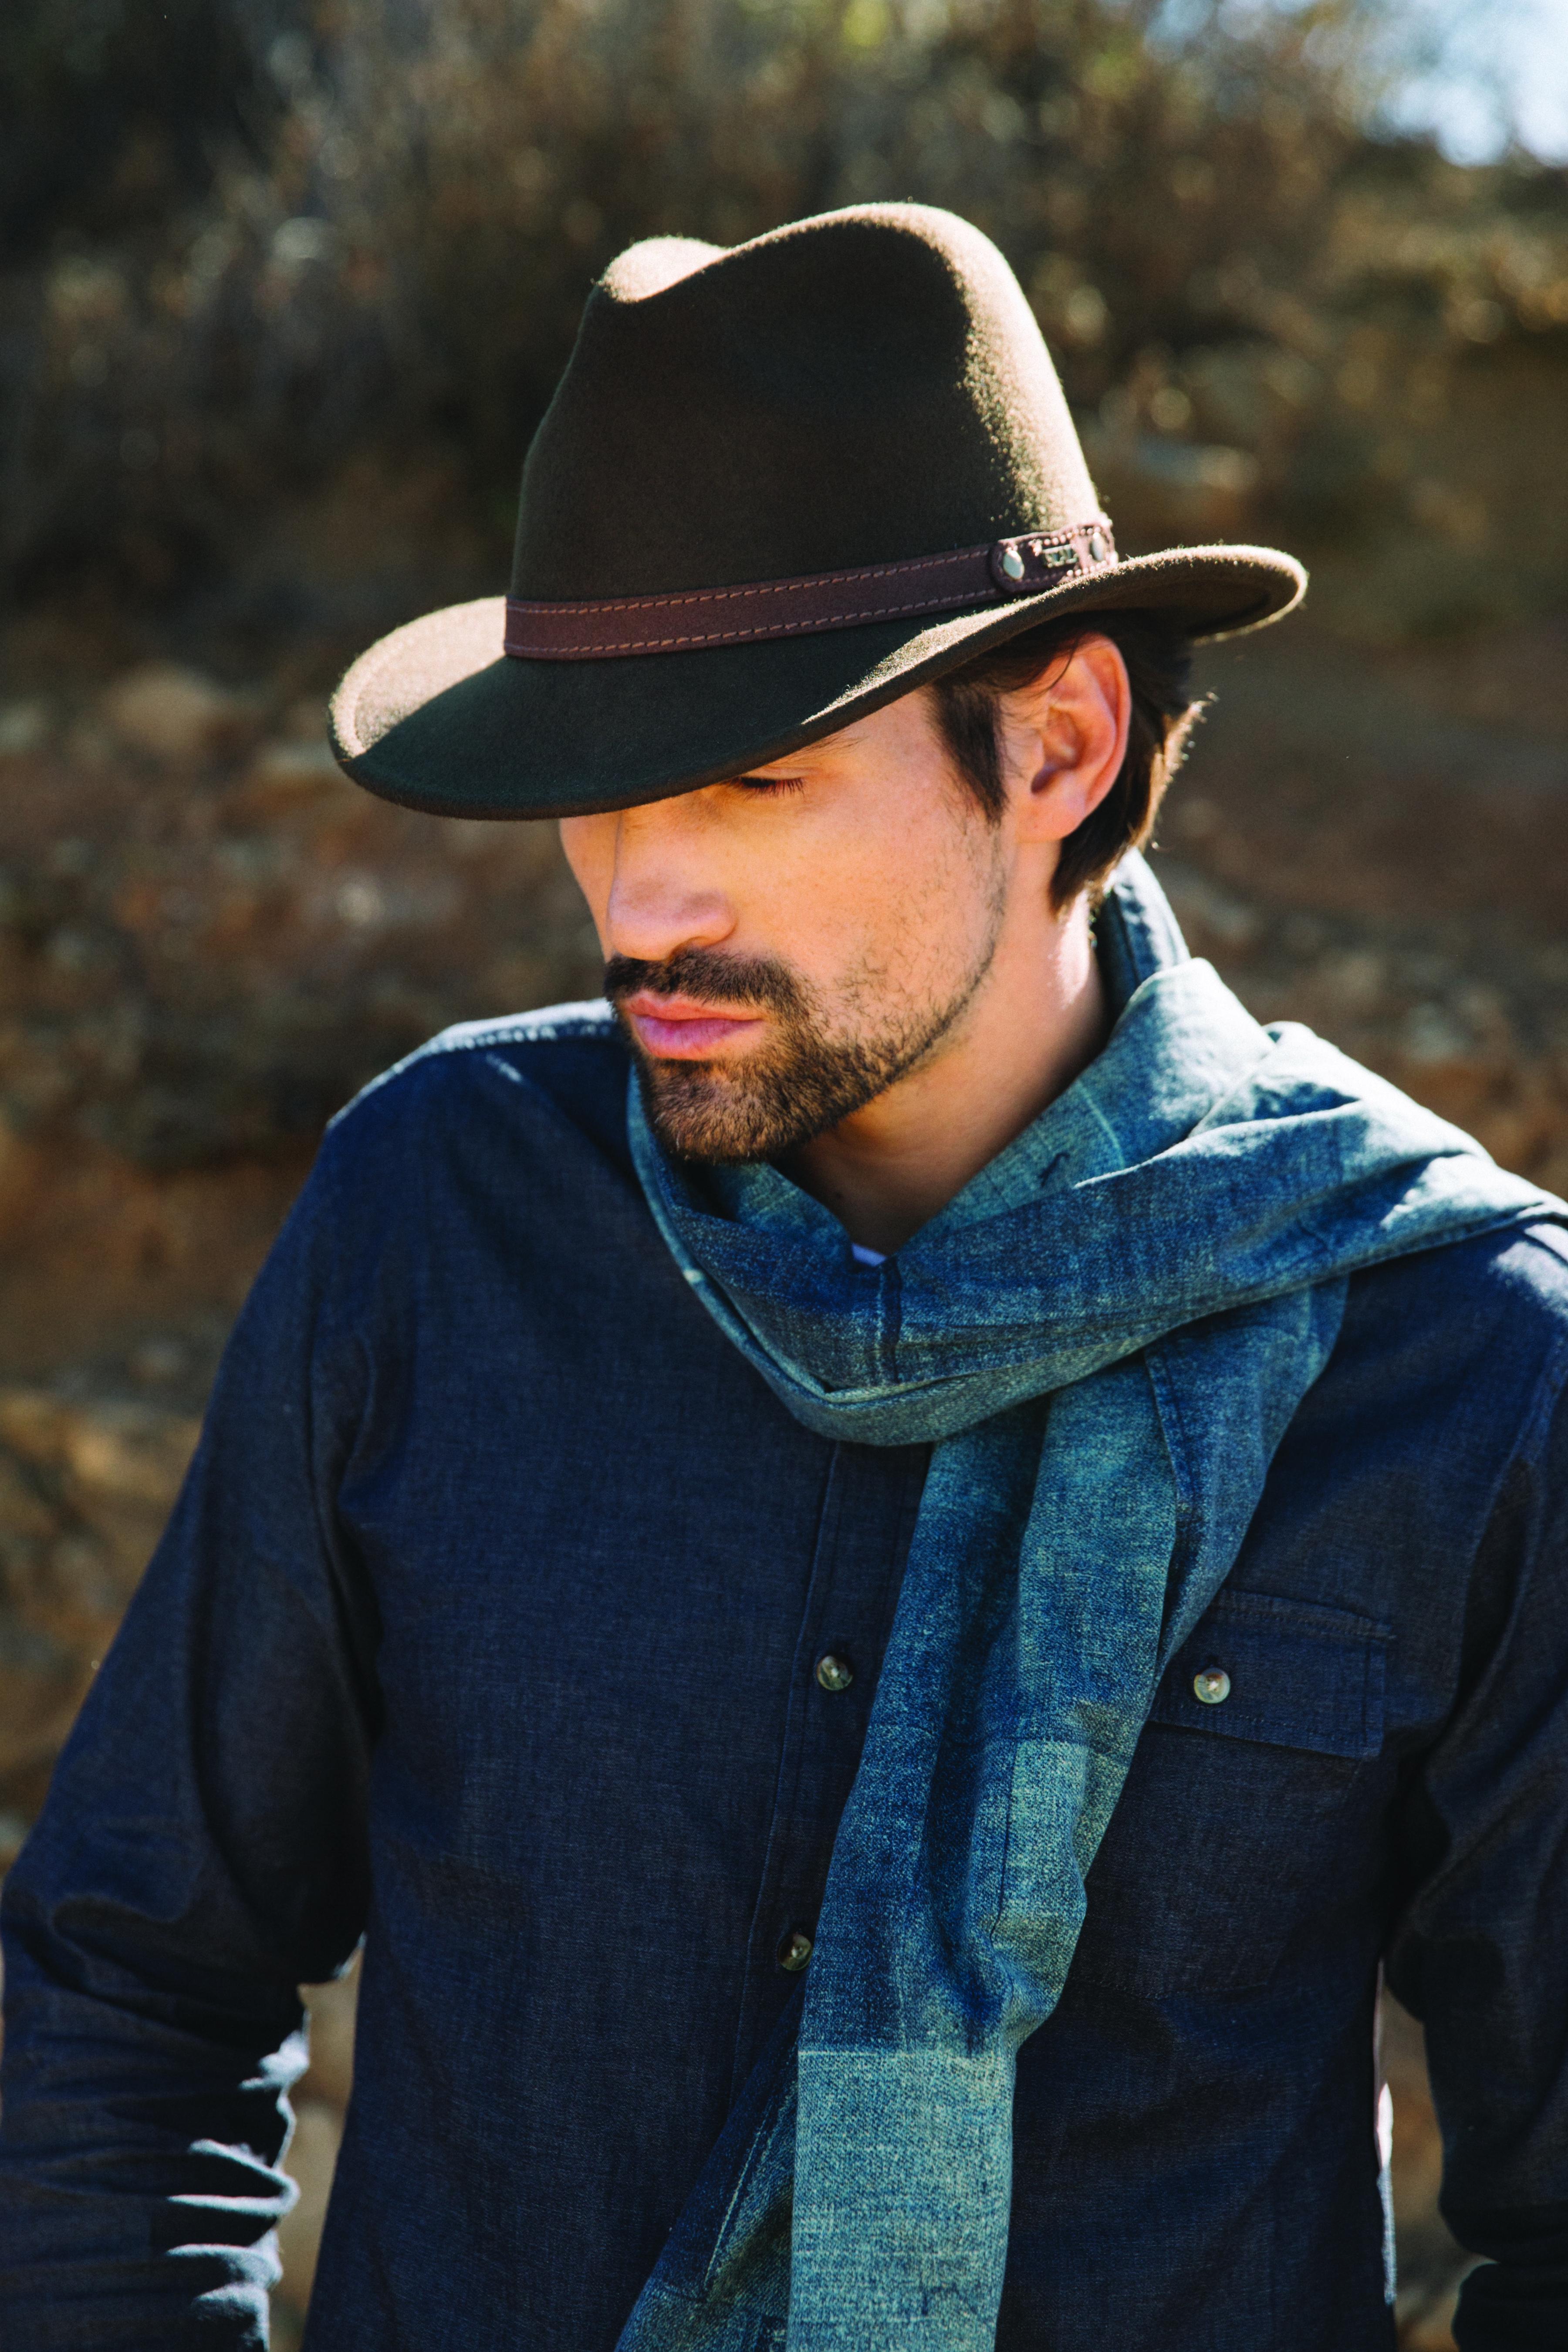 841dc5098c5 Men's outdoor fashion. Wool felt fedora hat. Scala | Men's Fashion ...